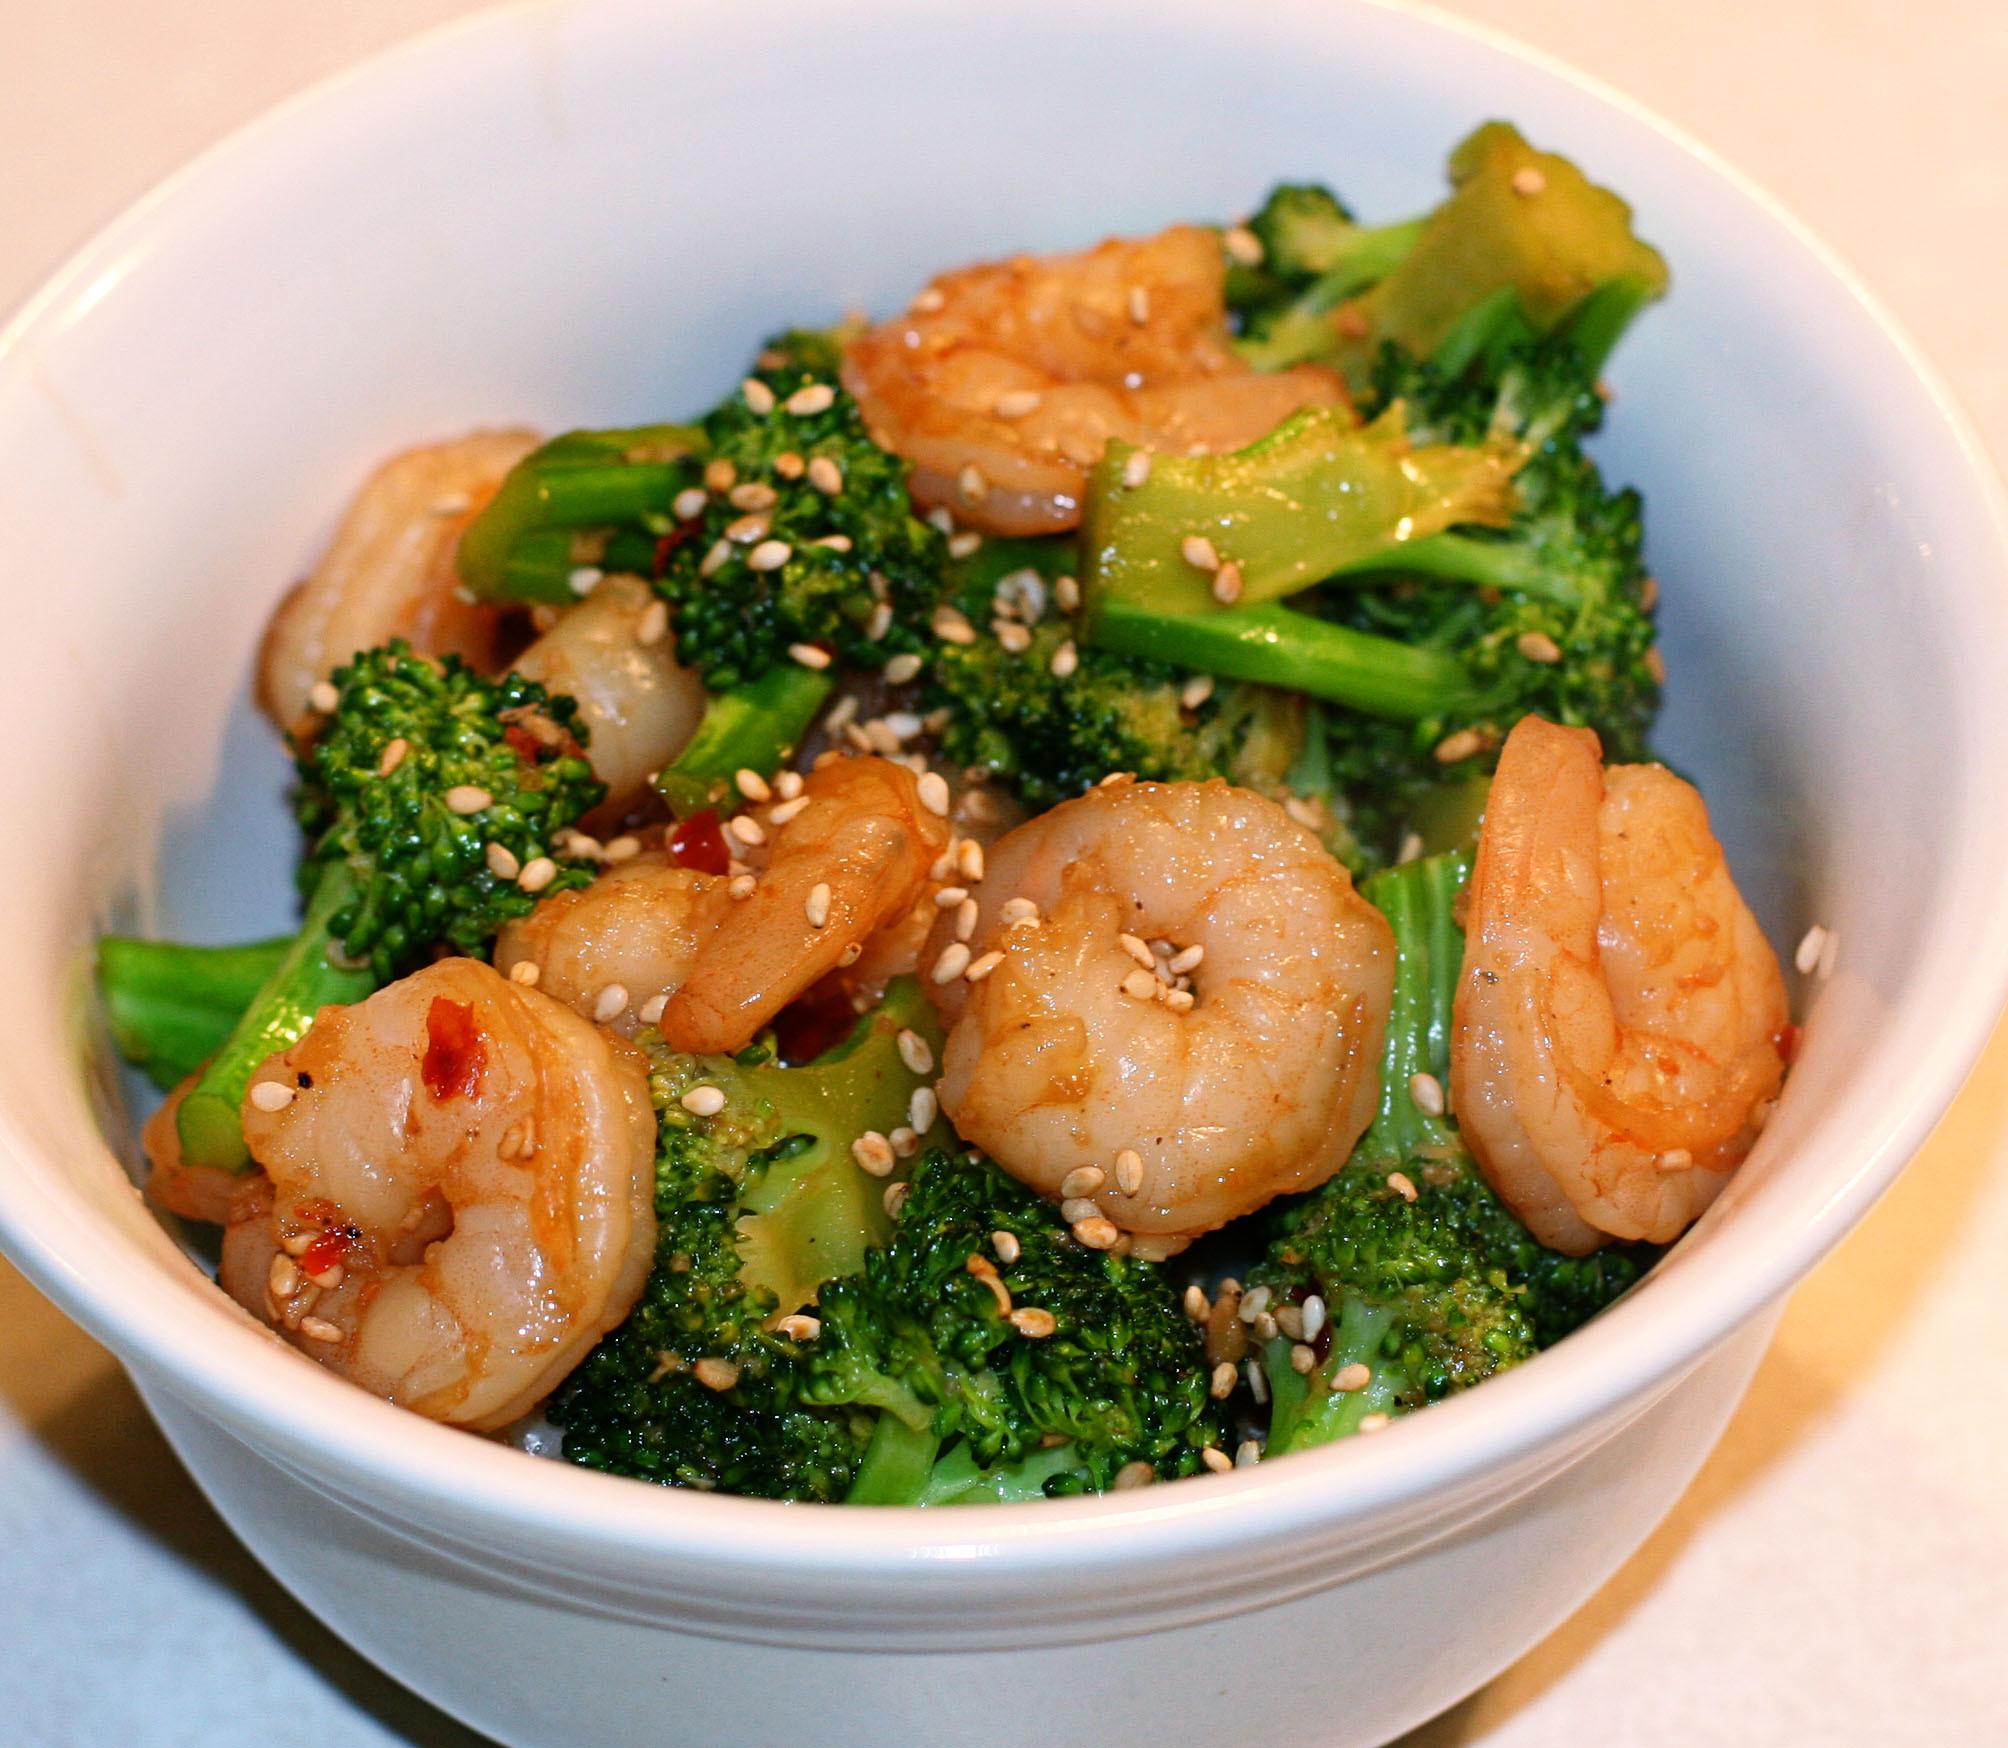 Shrimp And Broccoli  Sesame Shrimp and Broccoli